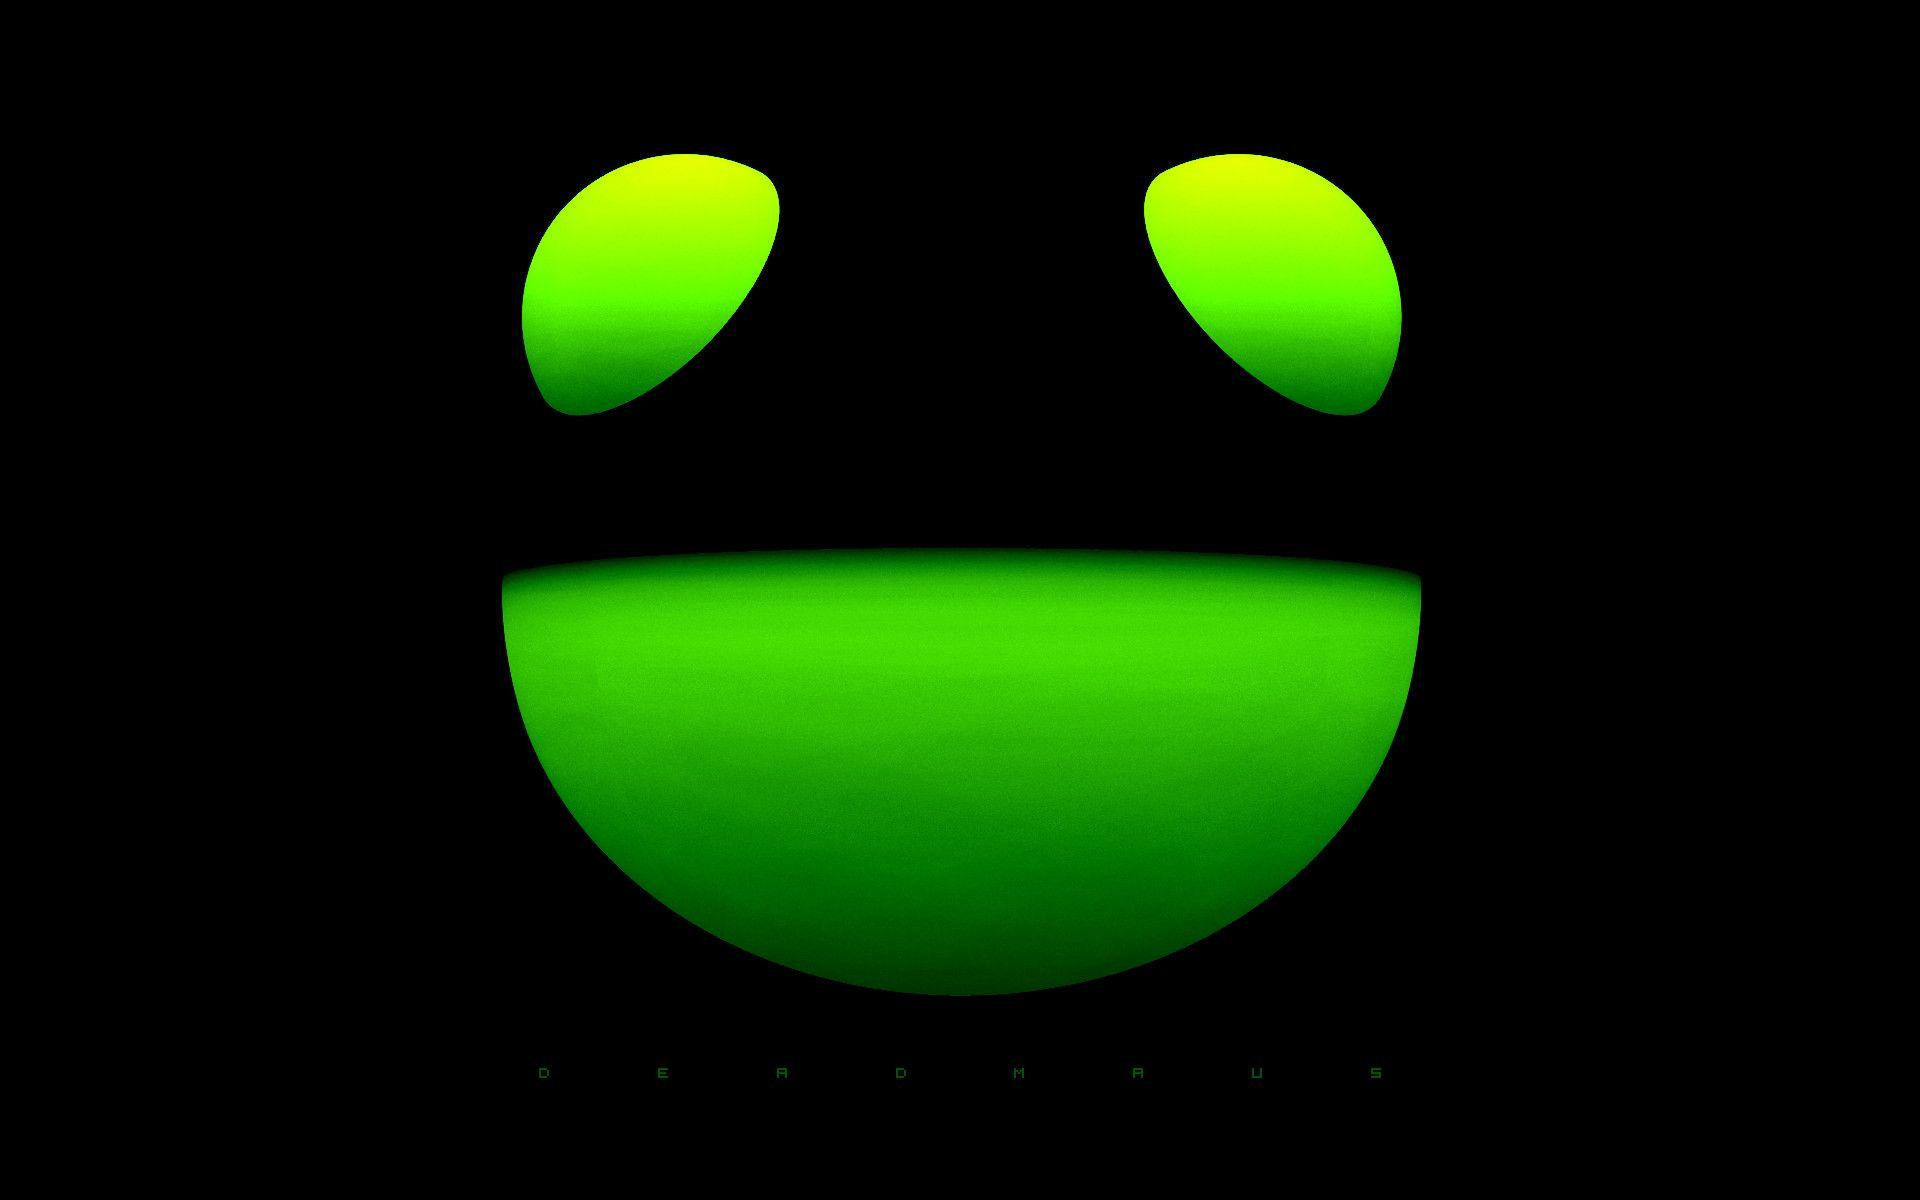 deadmau5 green wallpaper - photo #17